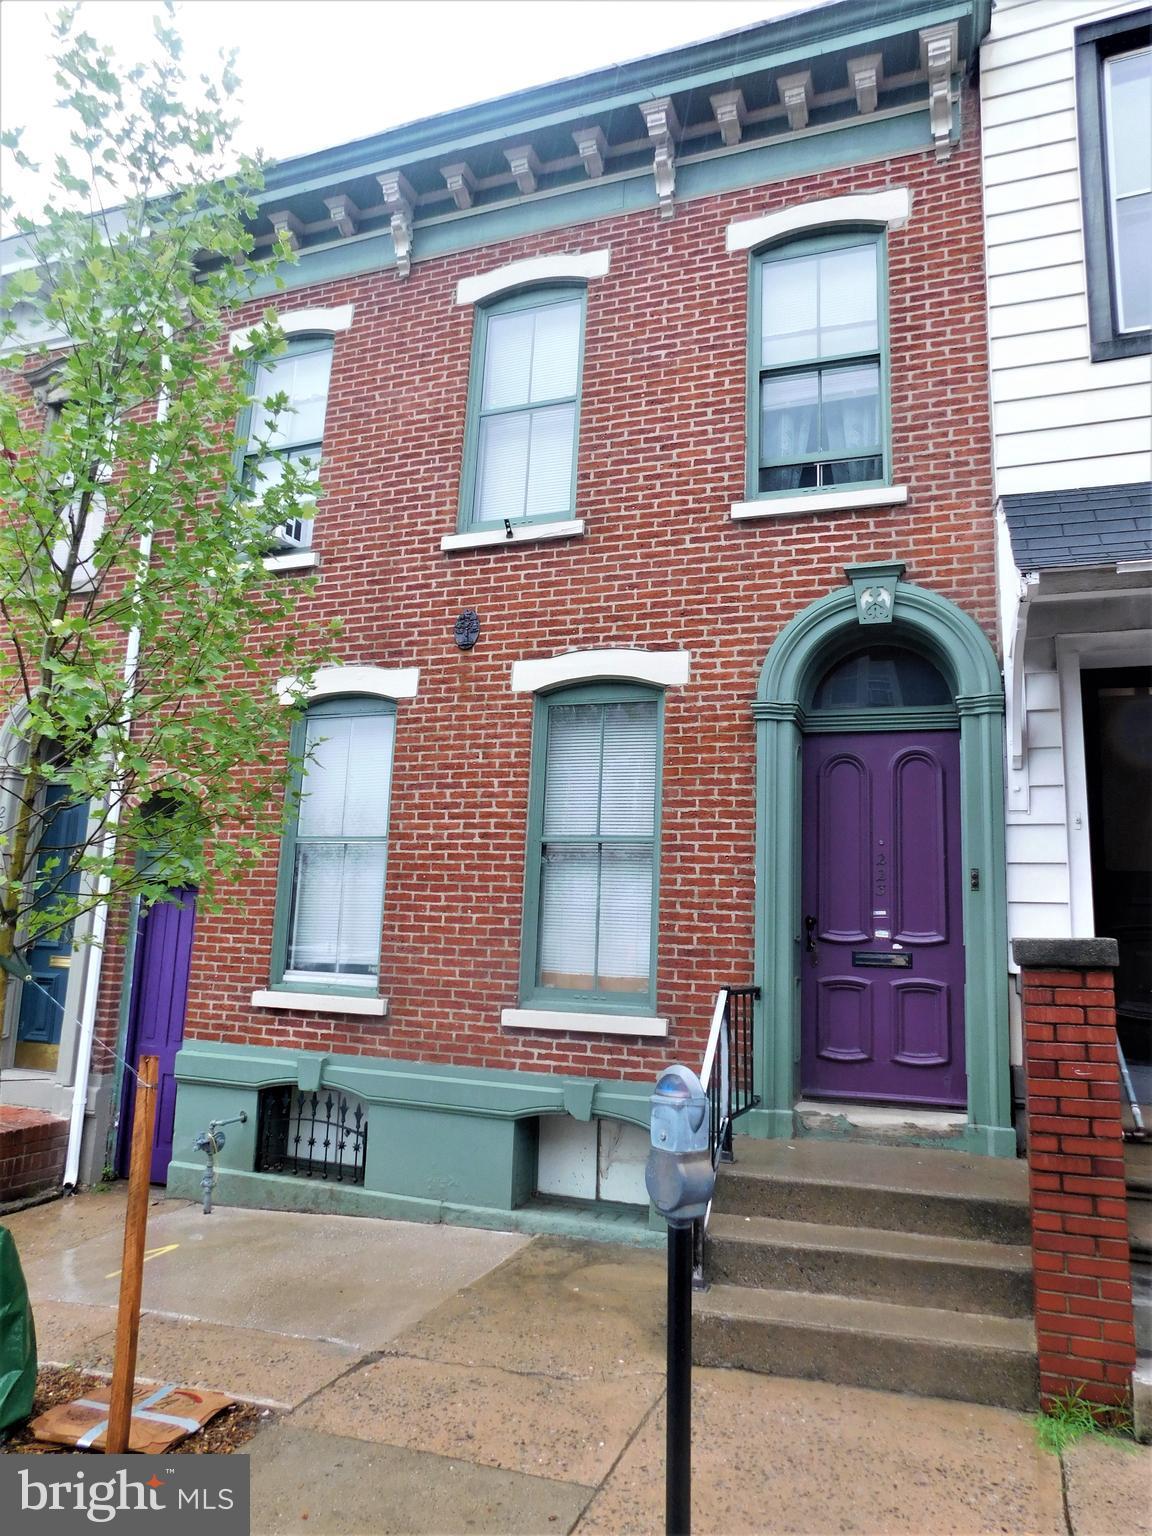 223 N 9TH STREET, ALLENTOWN, PA 18102